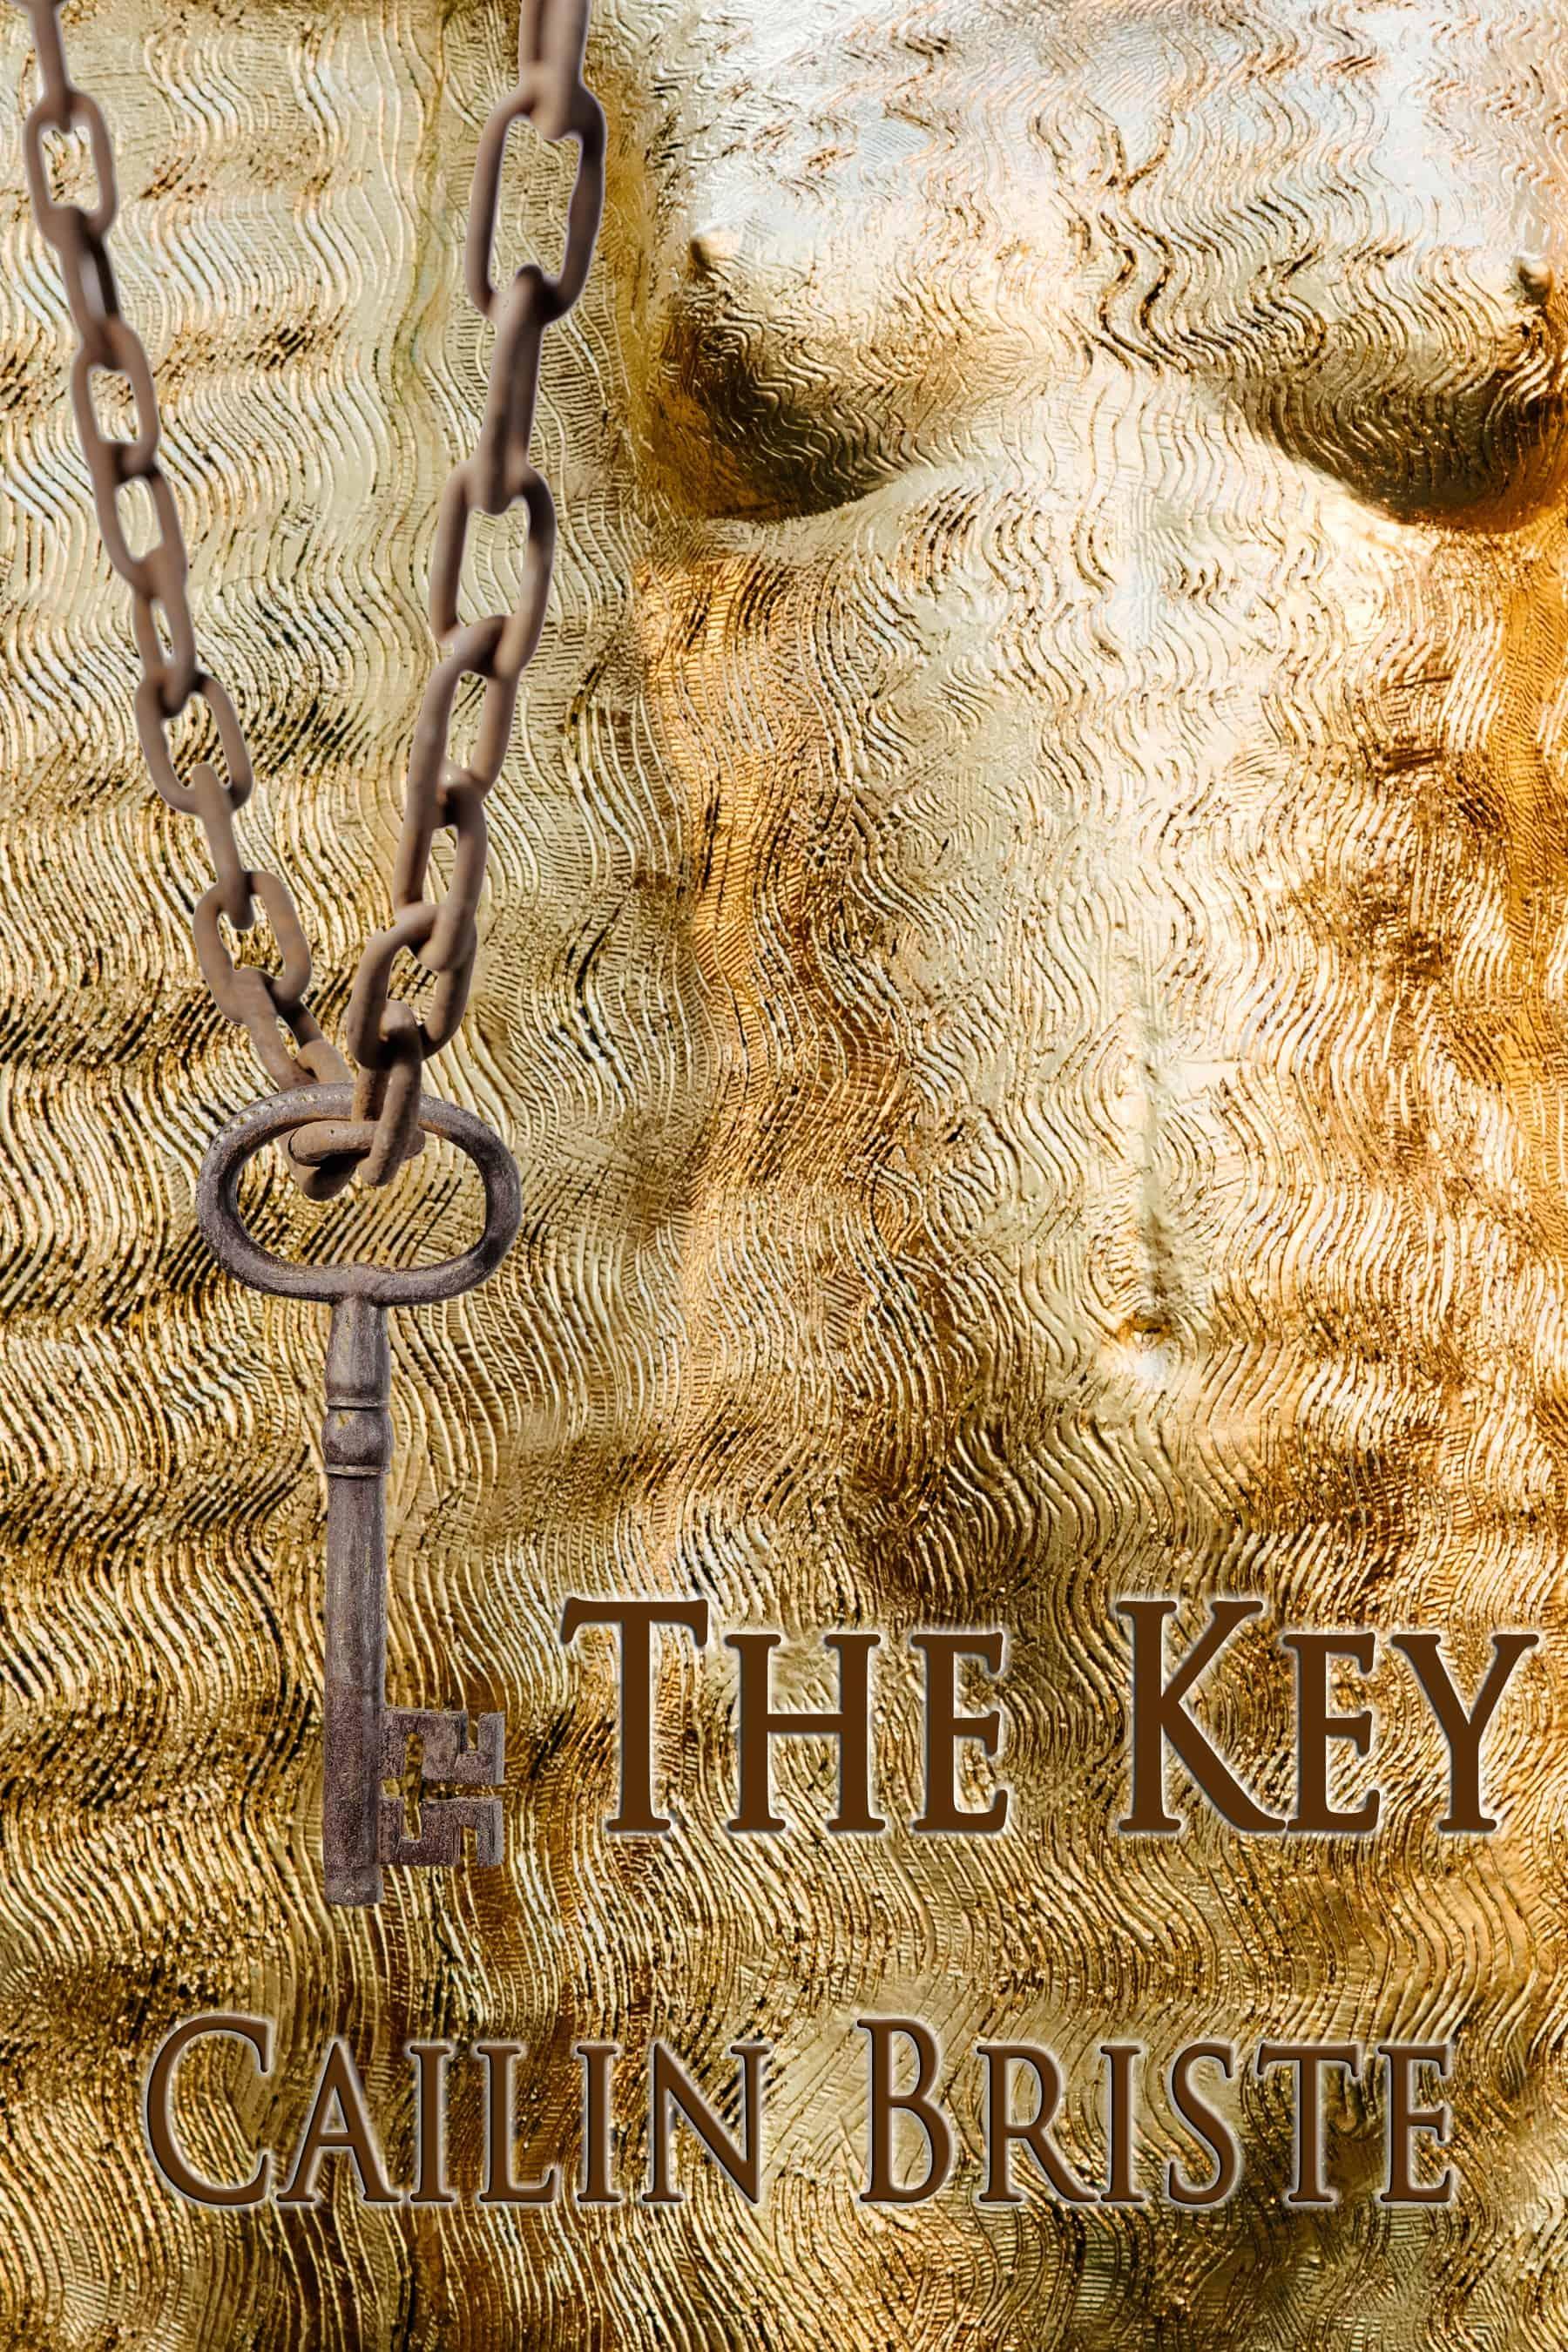 Subscribe to receive The Key #free @CailinBriste #scifi #eroticromance #scifirom #BDSMromance http://wp.me/P46KU8-7K